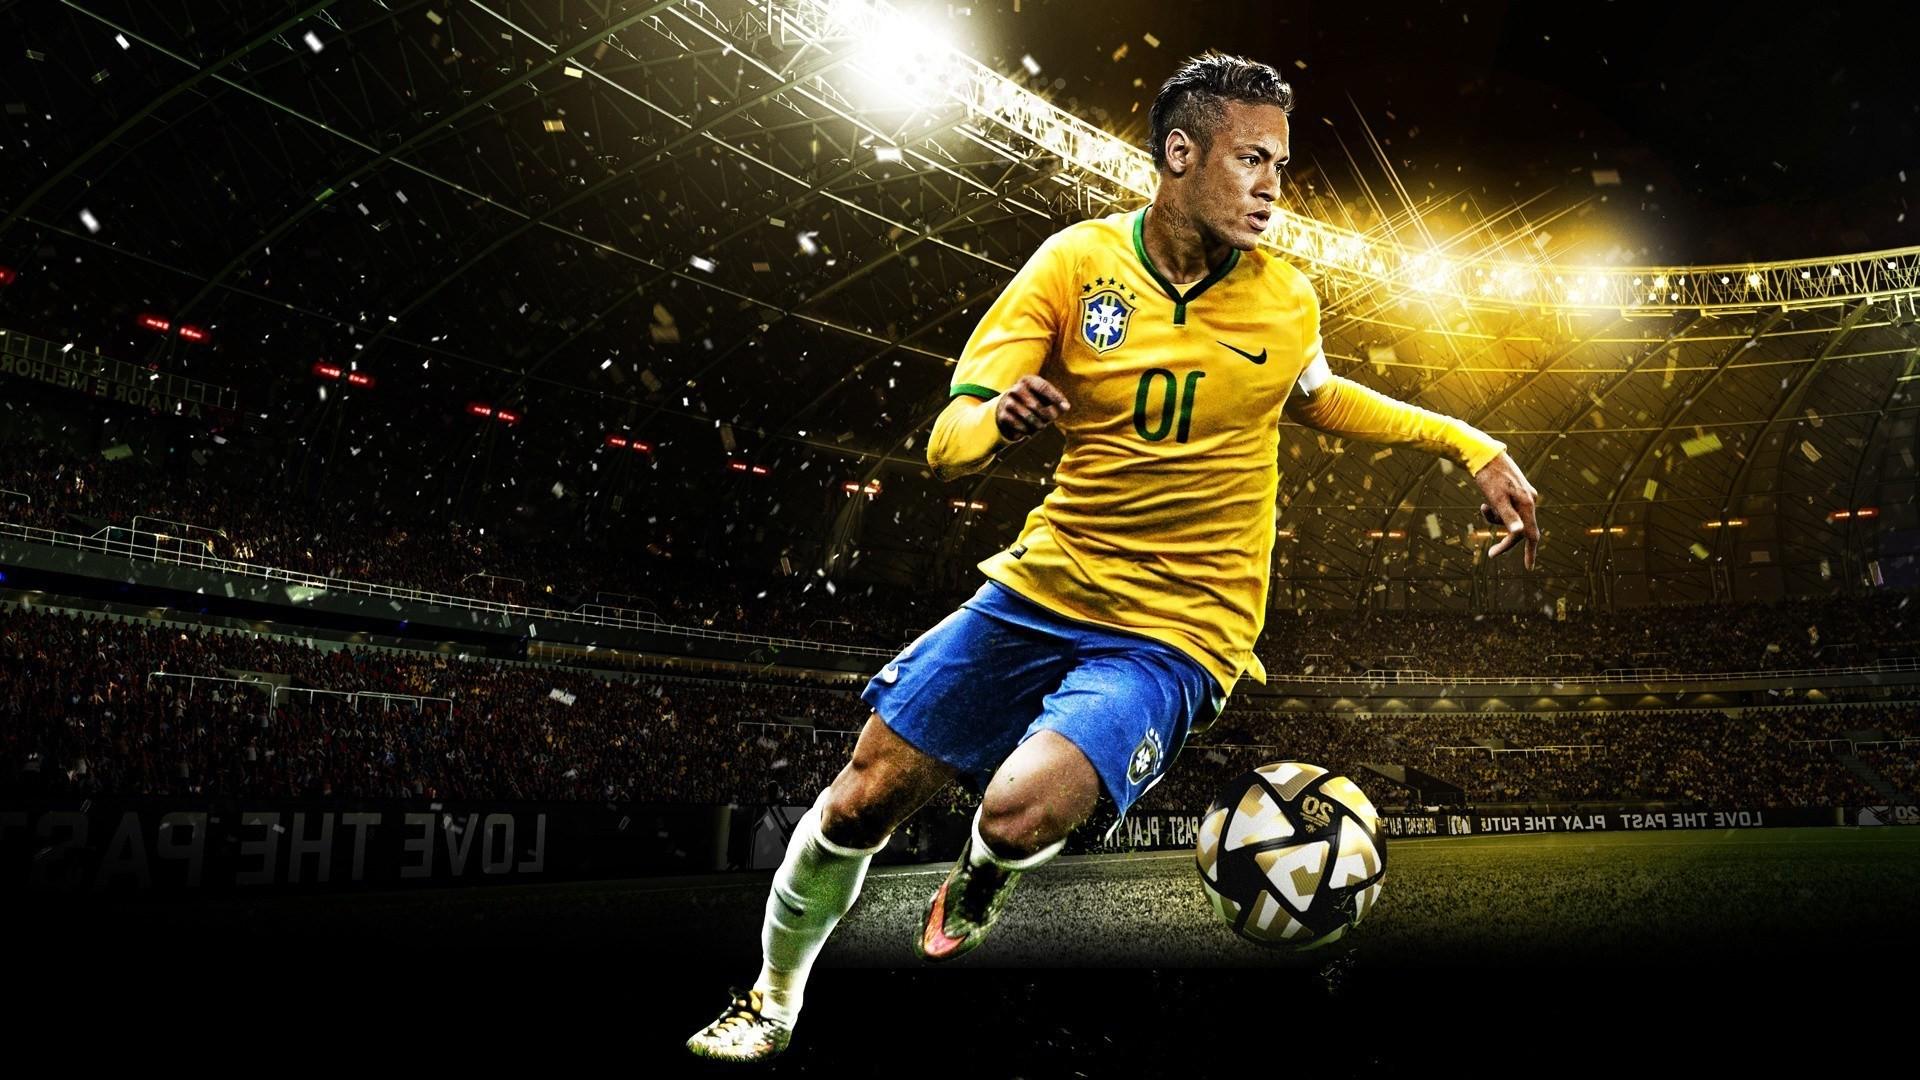 Neymar Wallpapers 2017 HD – Wallpaper Cave